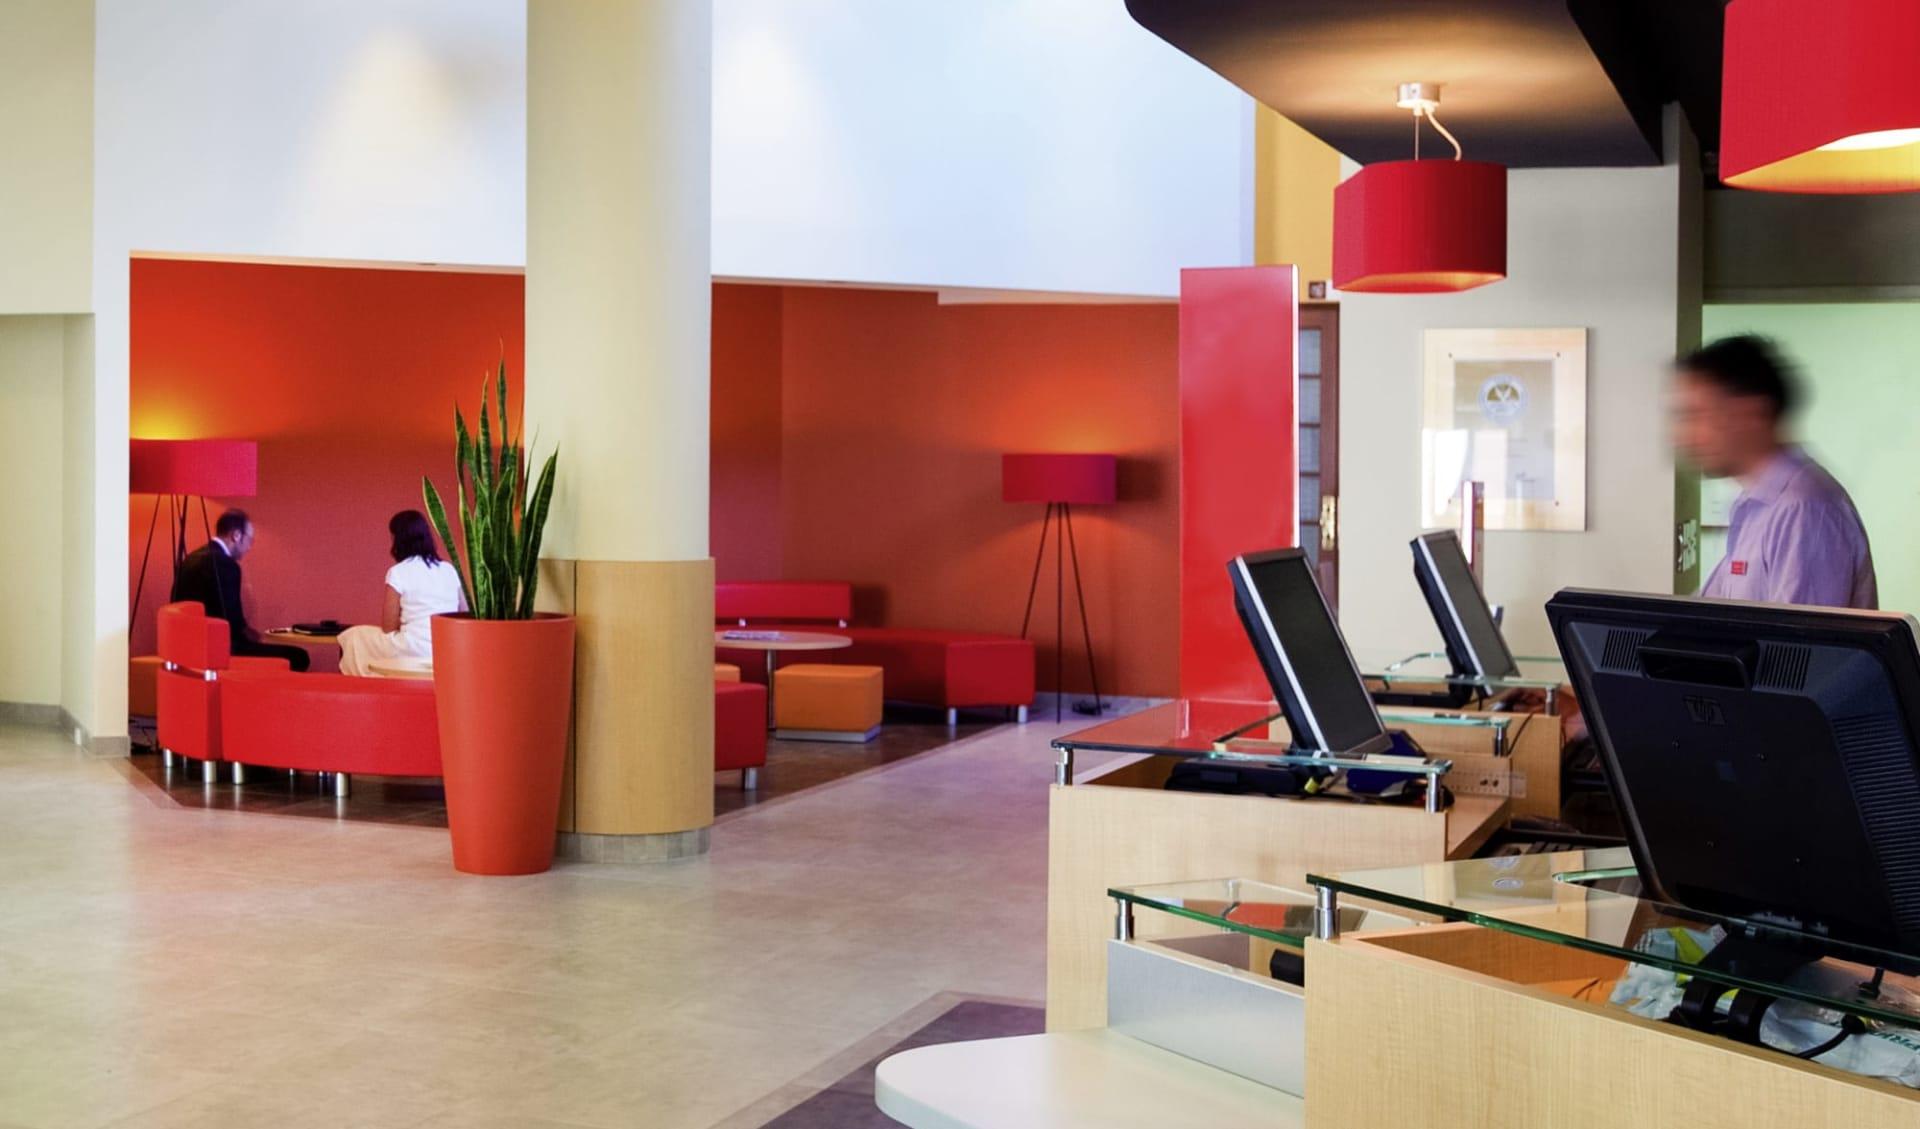 Hotel Ibis Perth:  Ibis Perth - Reception